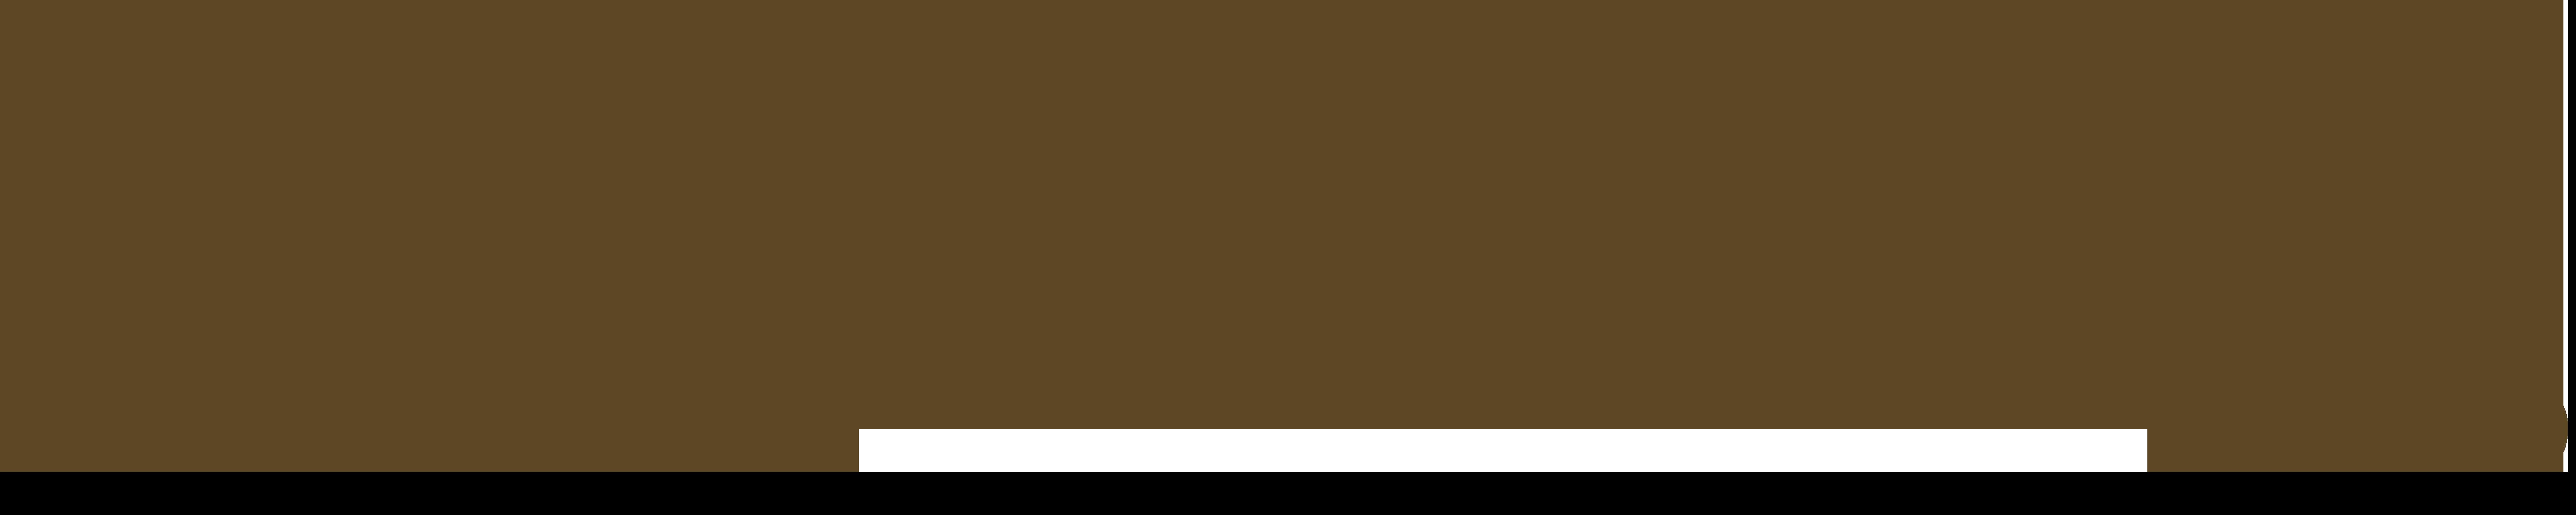 DiscipleLife 2020